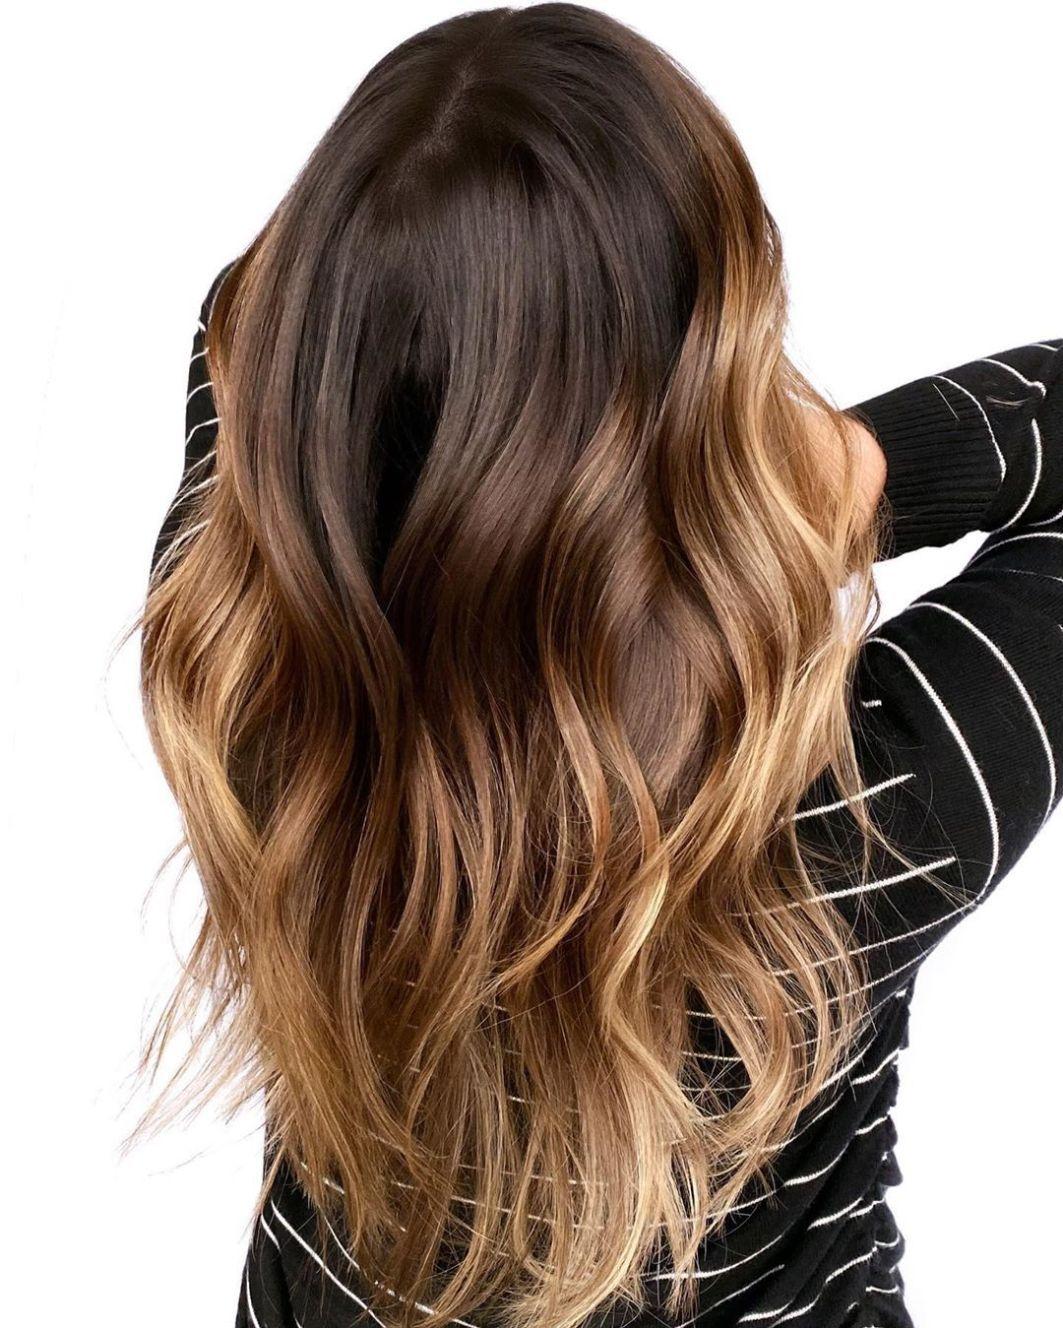 40 Most Popular Ombre Hair Ideas For 2021 Hair Adviser Balyaj Sac Renkleri Sari Sac Renkleri